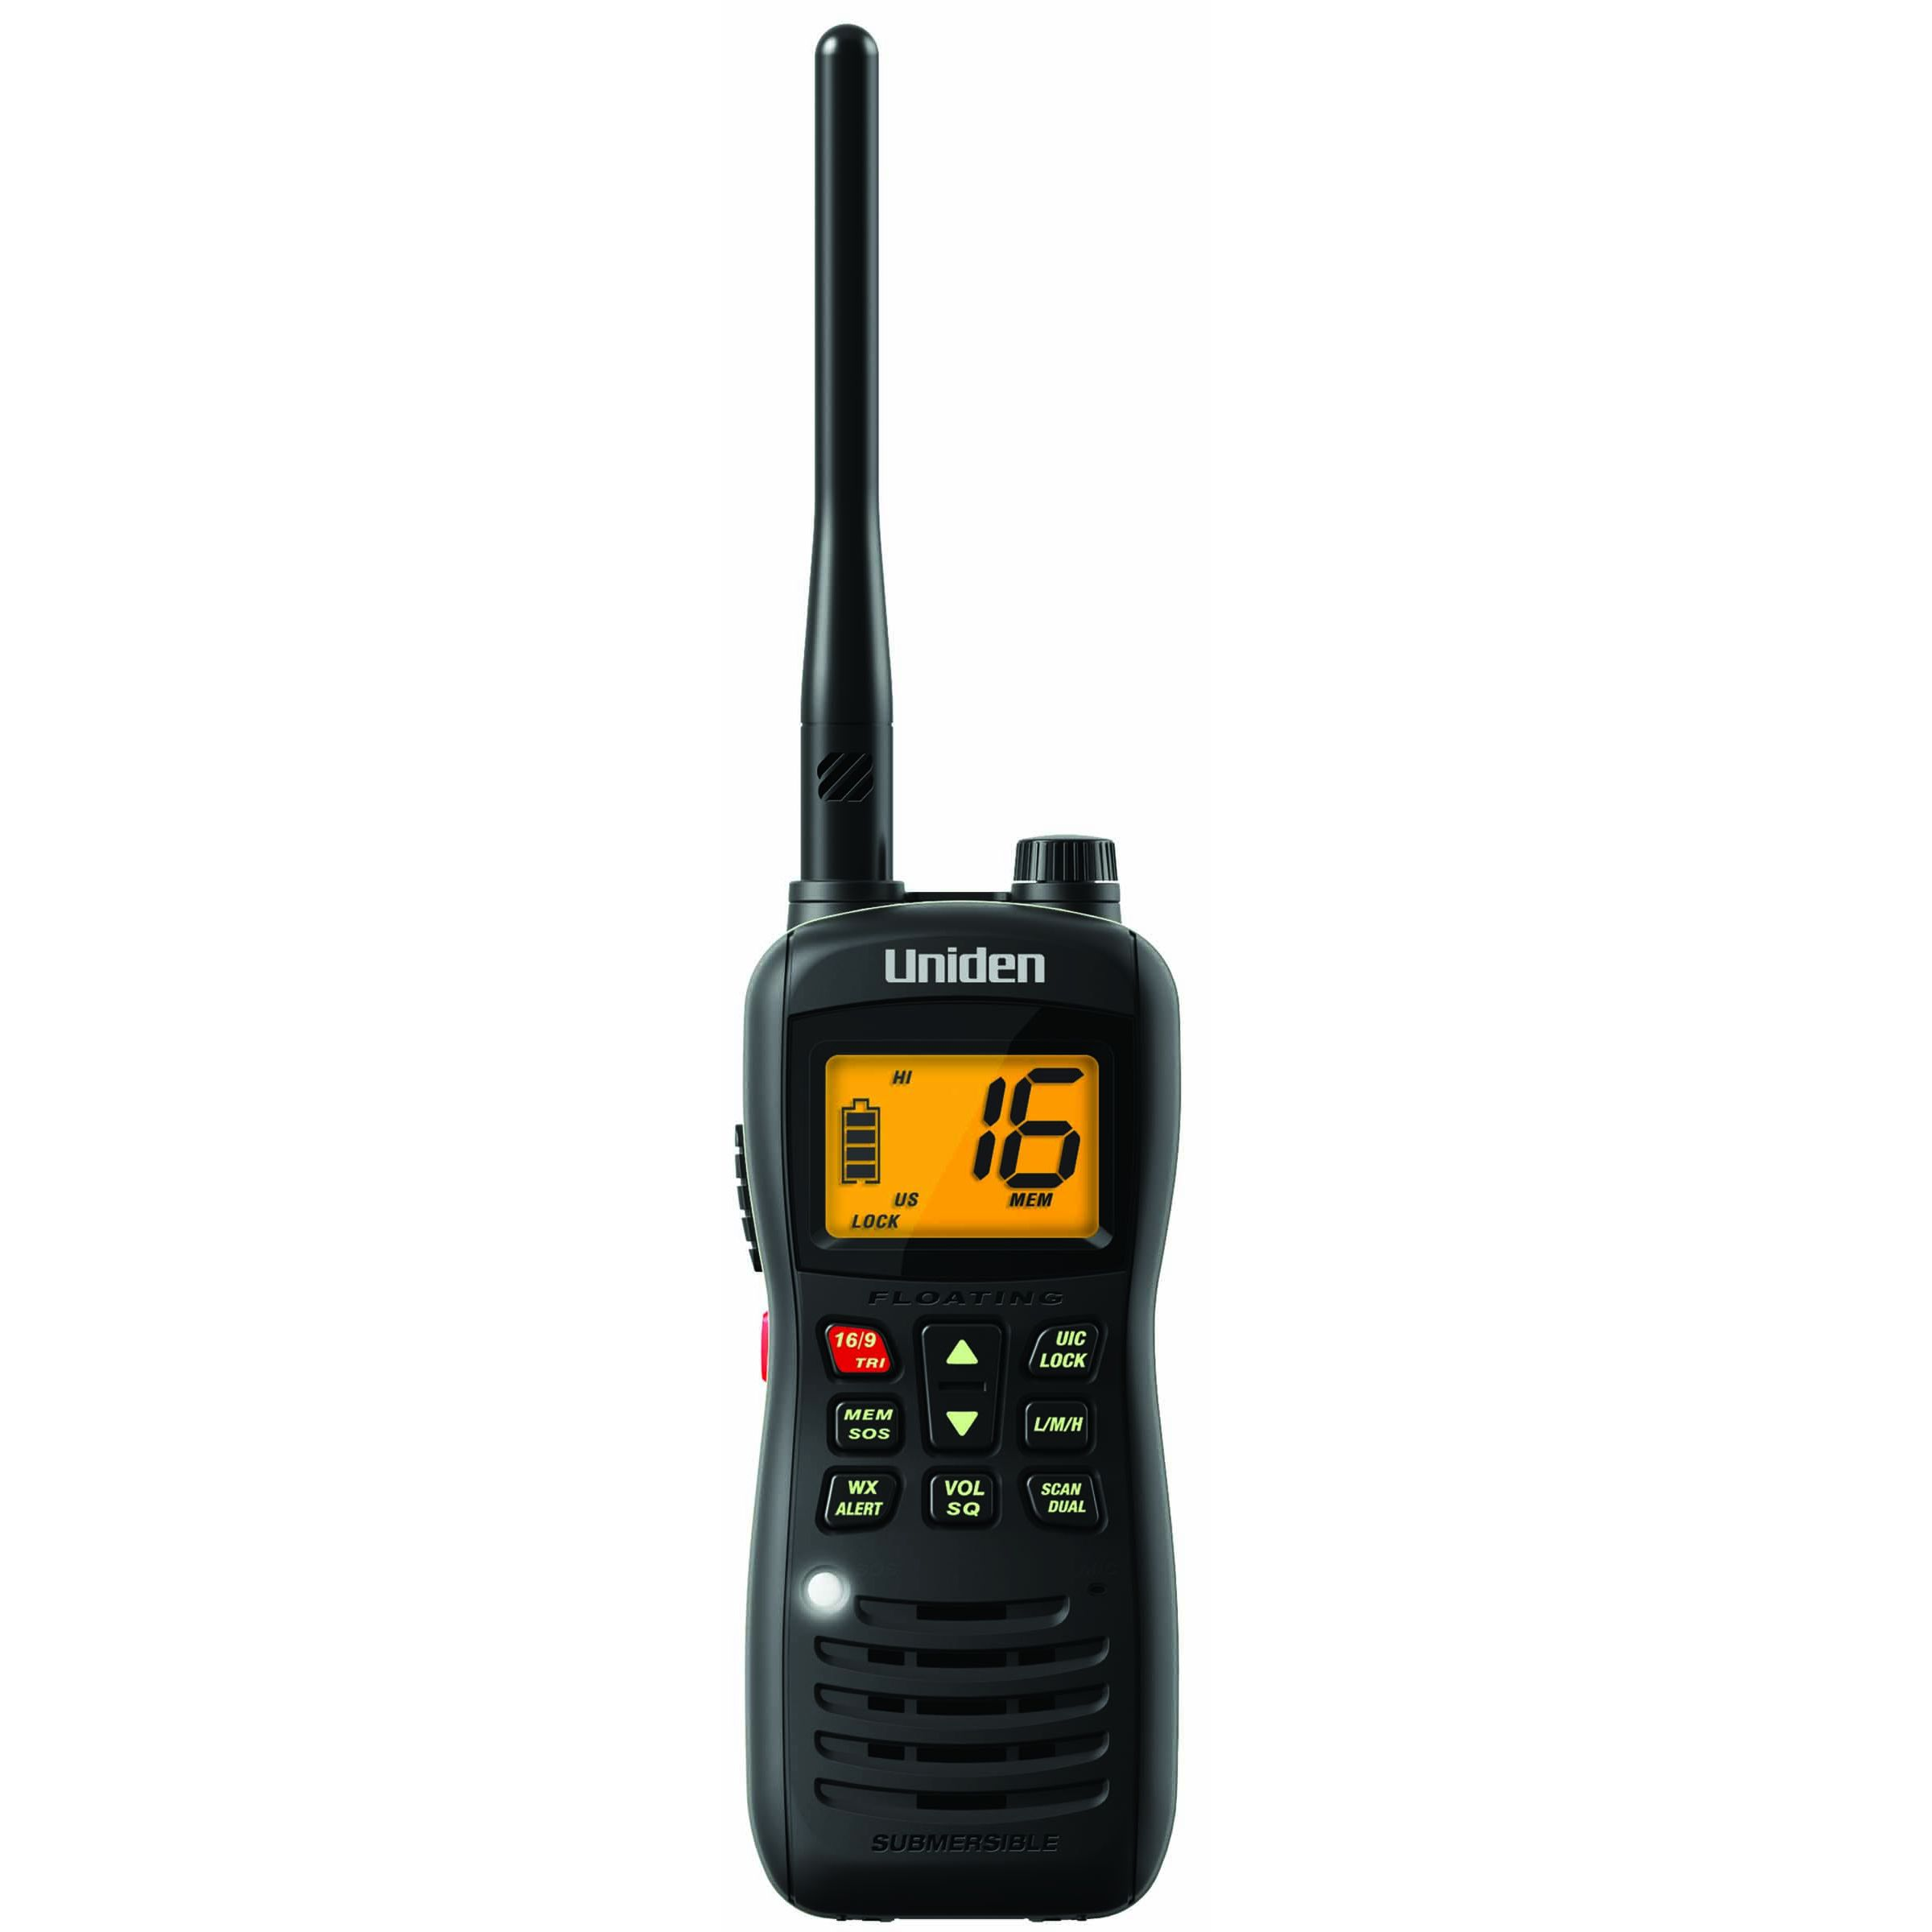 MHS126 - Uniden Floating Handheld VHF Marine Radio